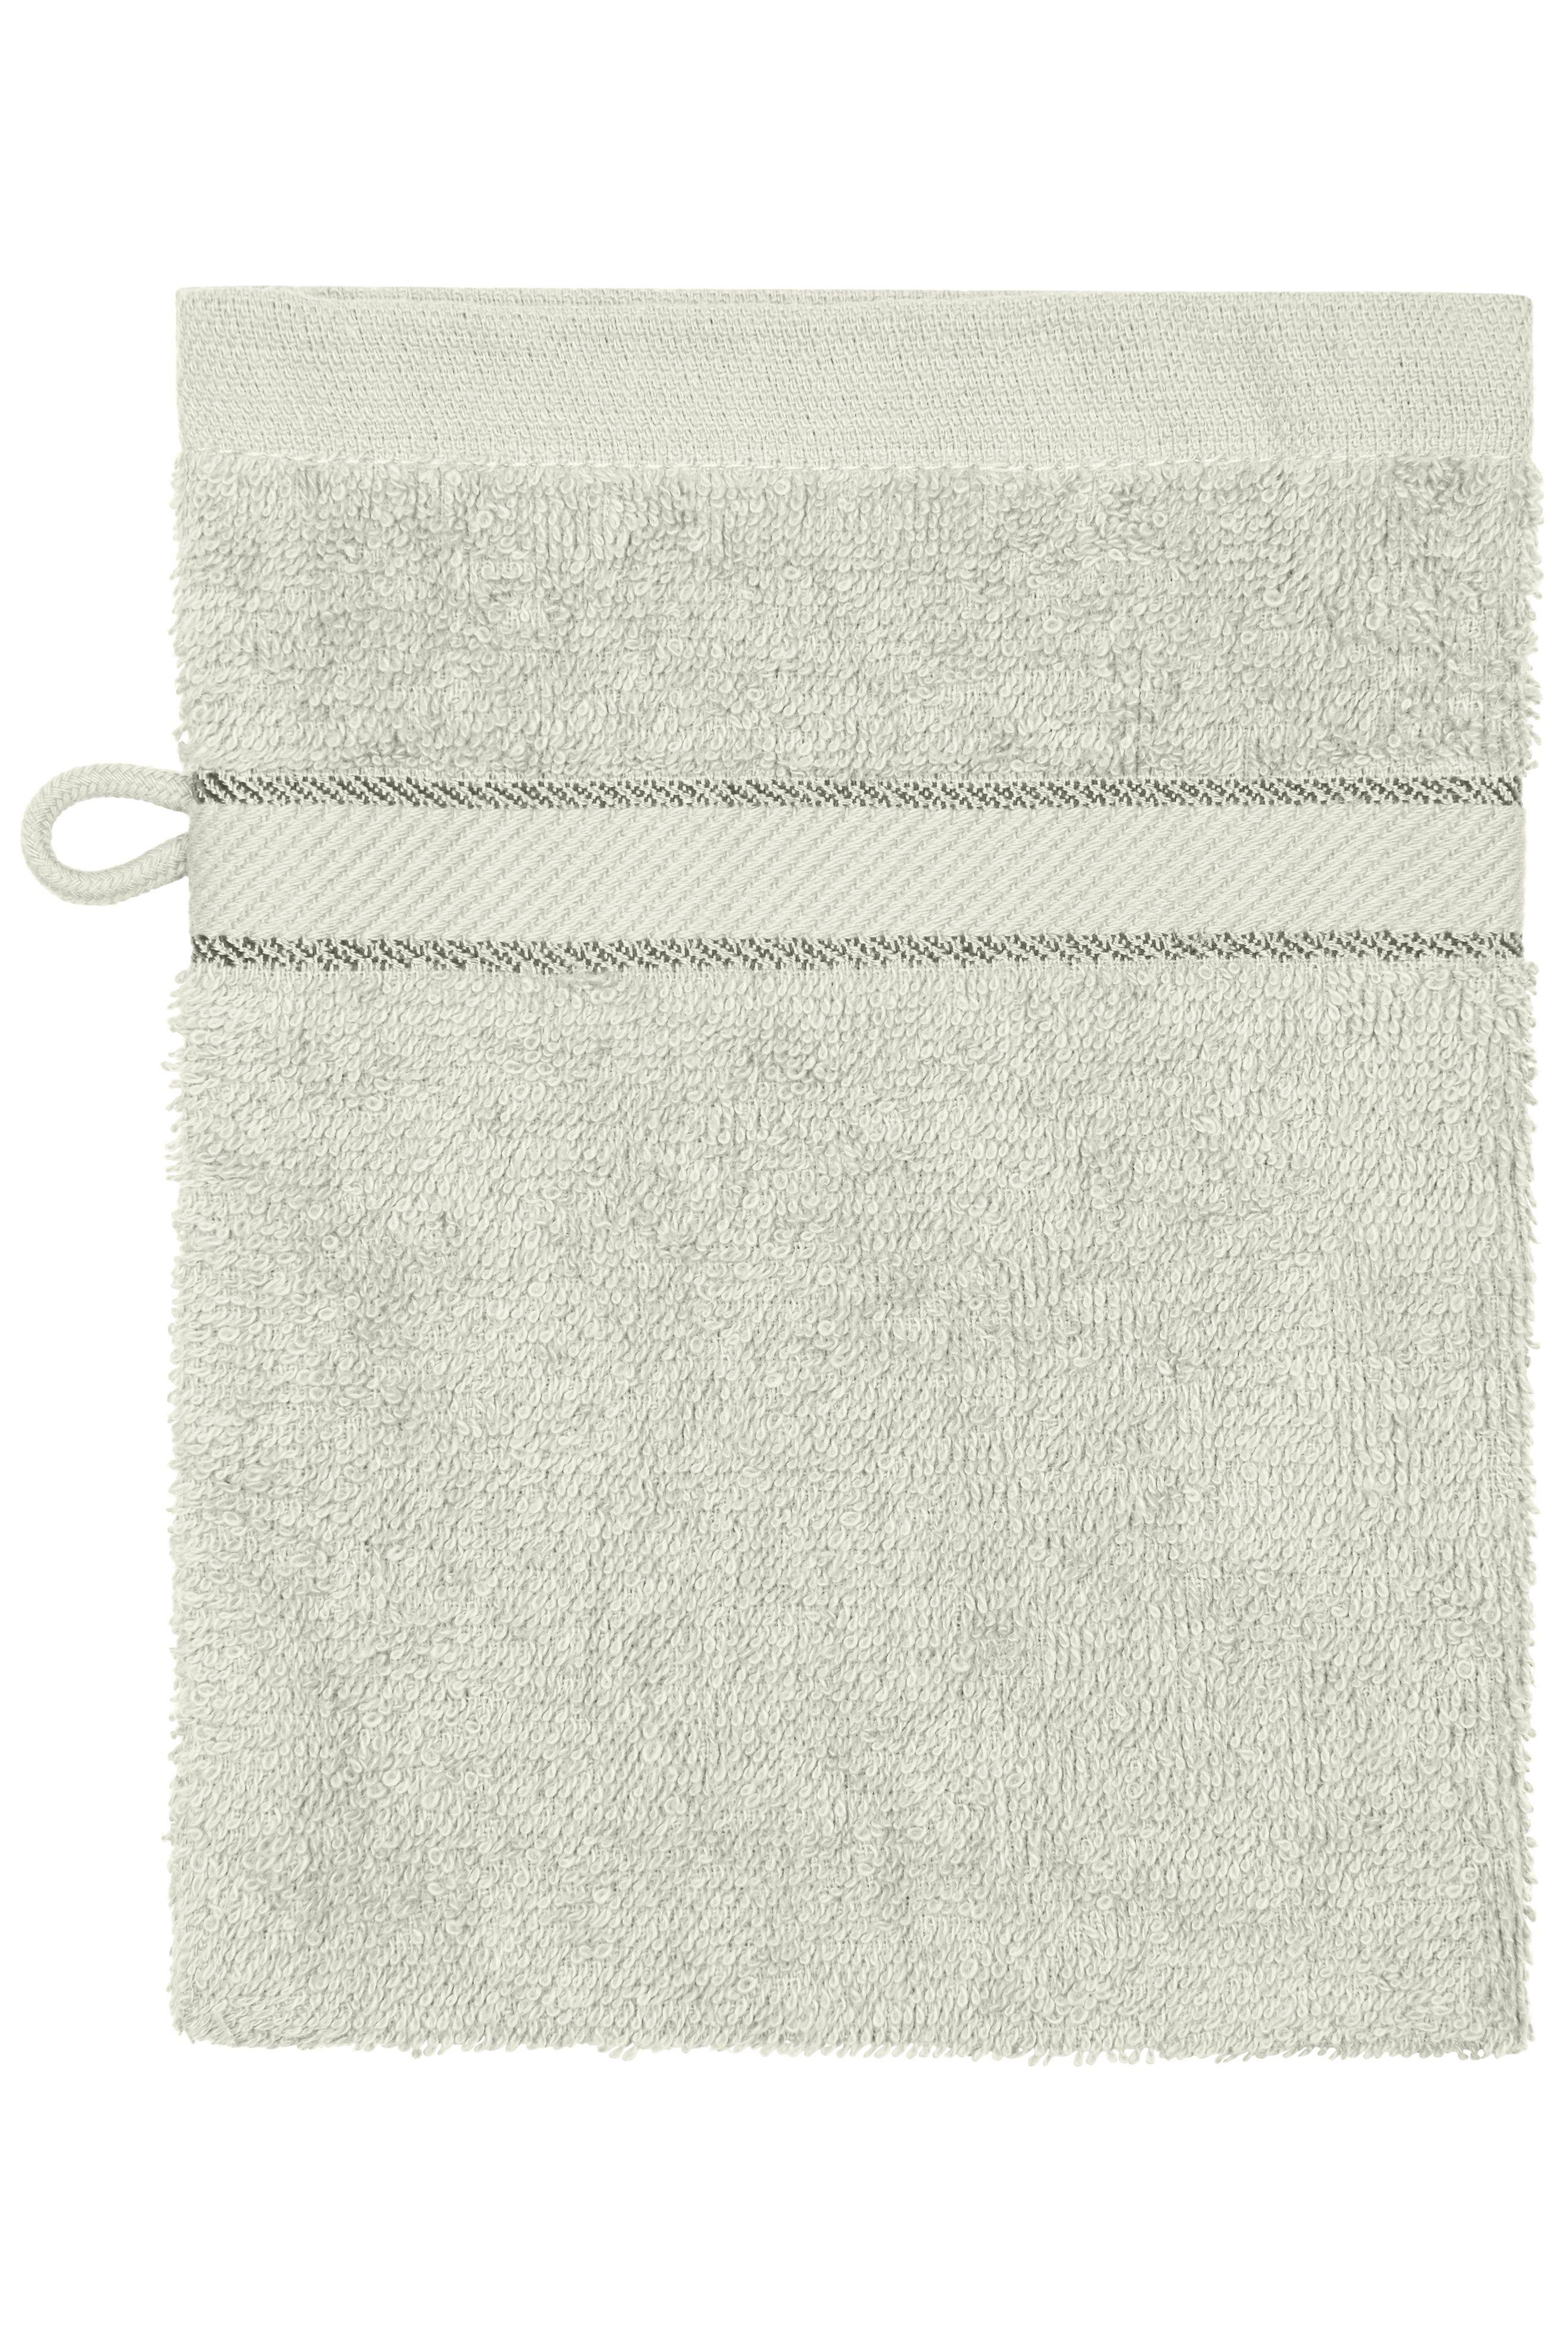 Waschhandschuh im dezenten Design